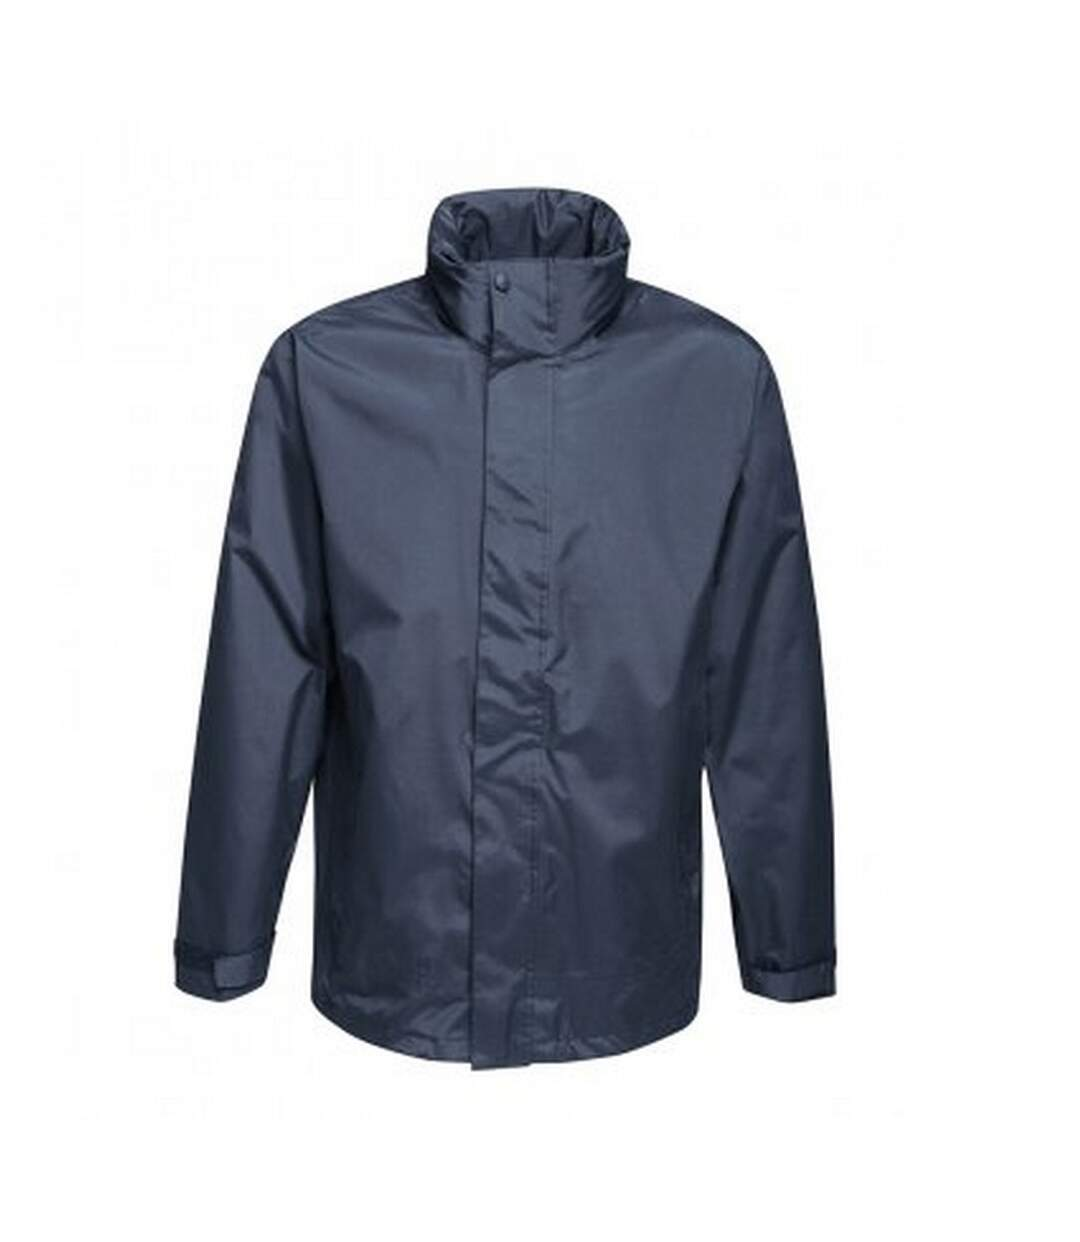 Regatta Mens Gibson IV Waterproof Interactive Jacket (Navy/Navy) - UTPC3306